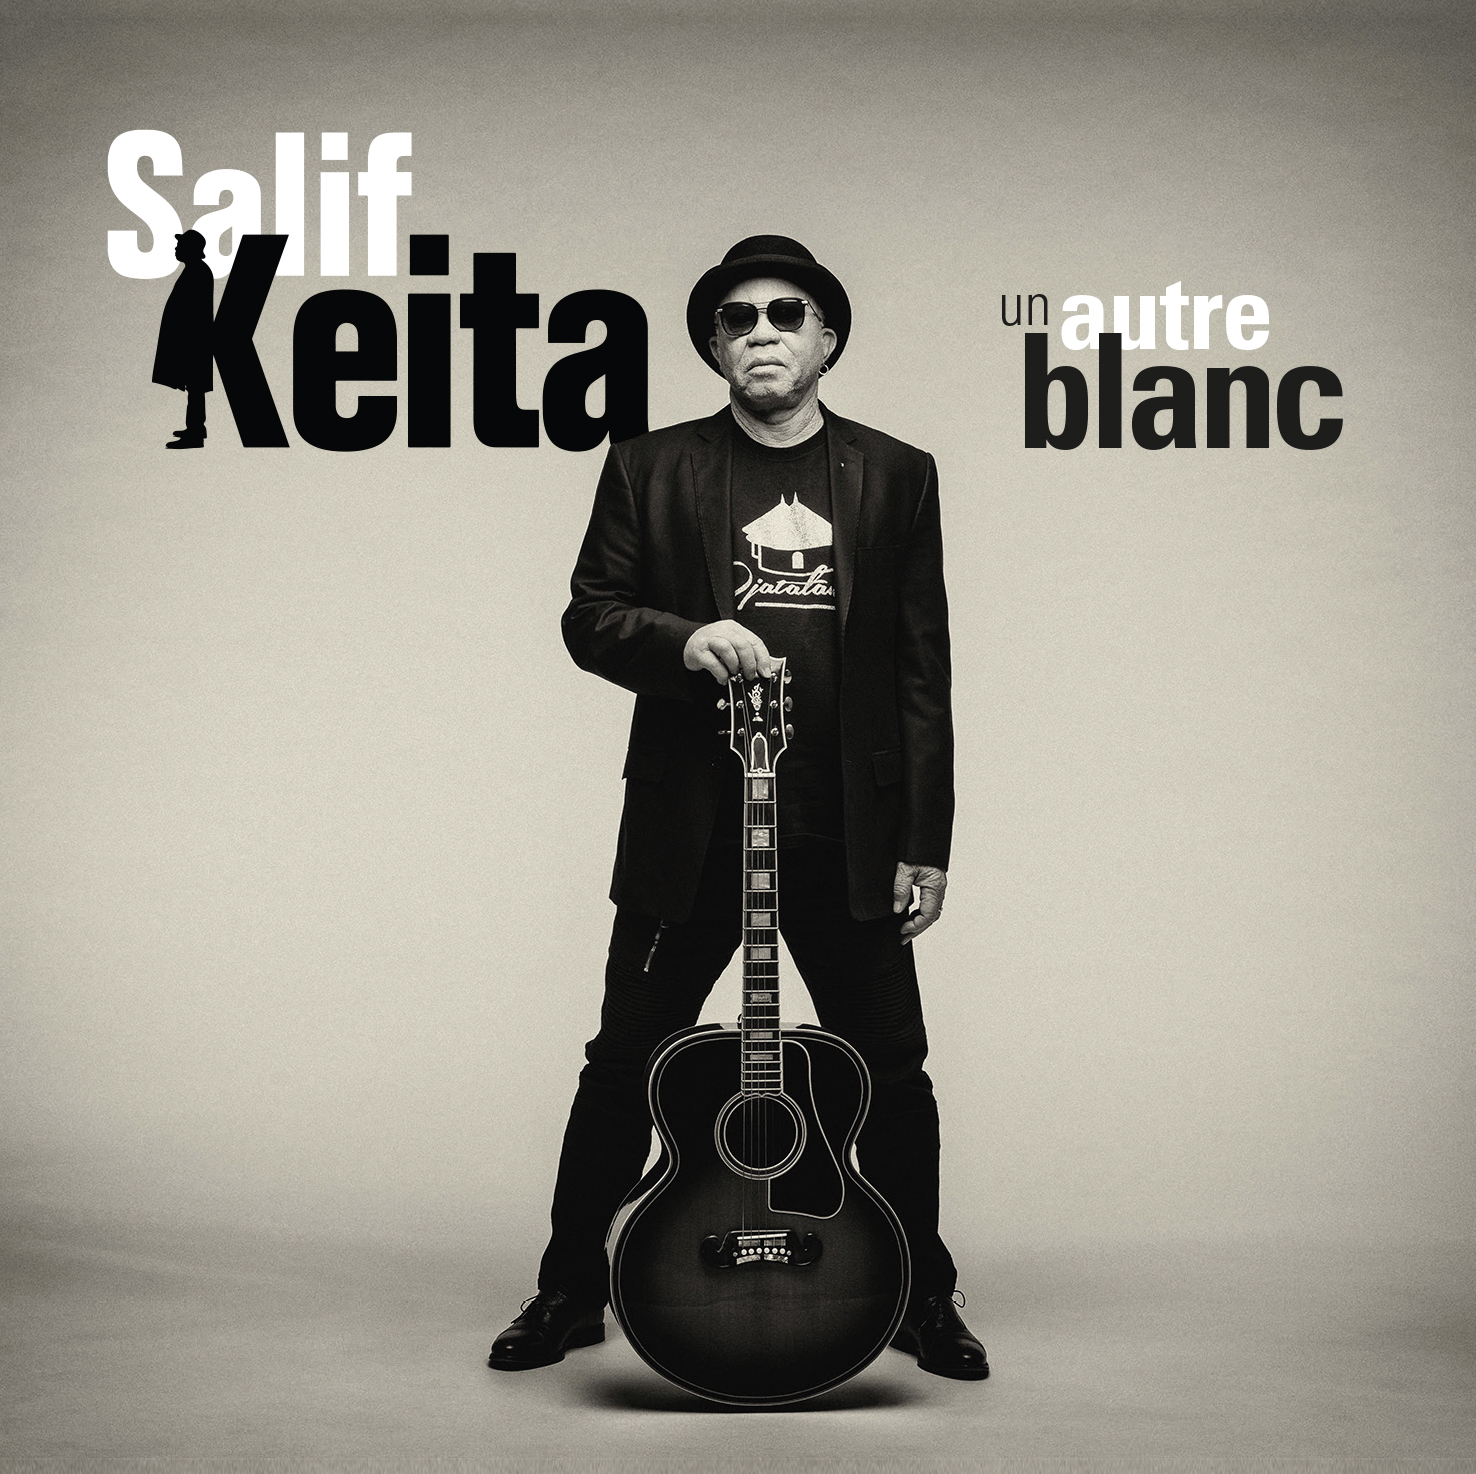 Salif Keita-un autre blanc